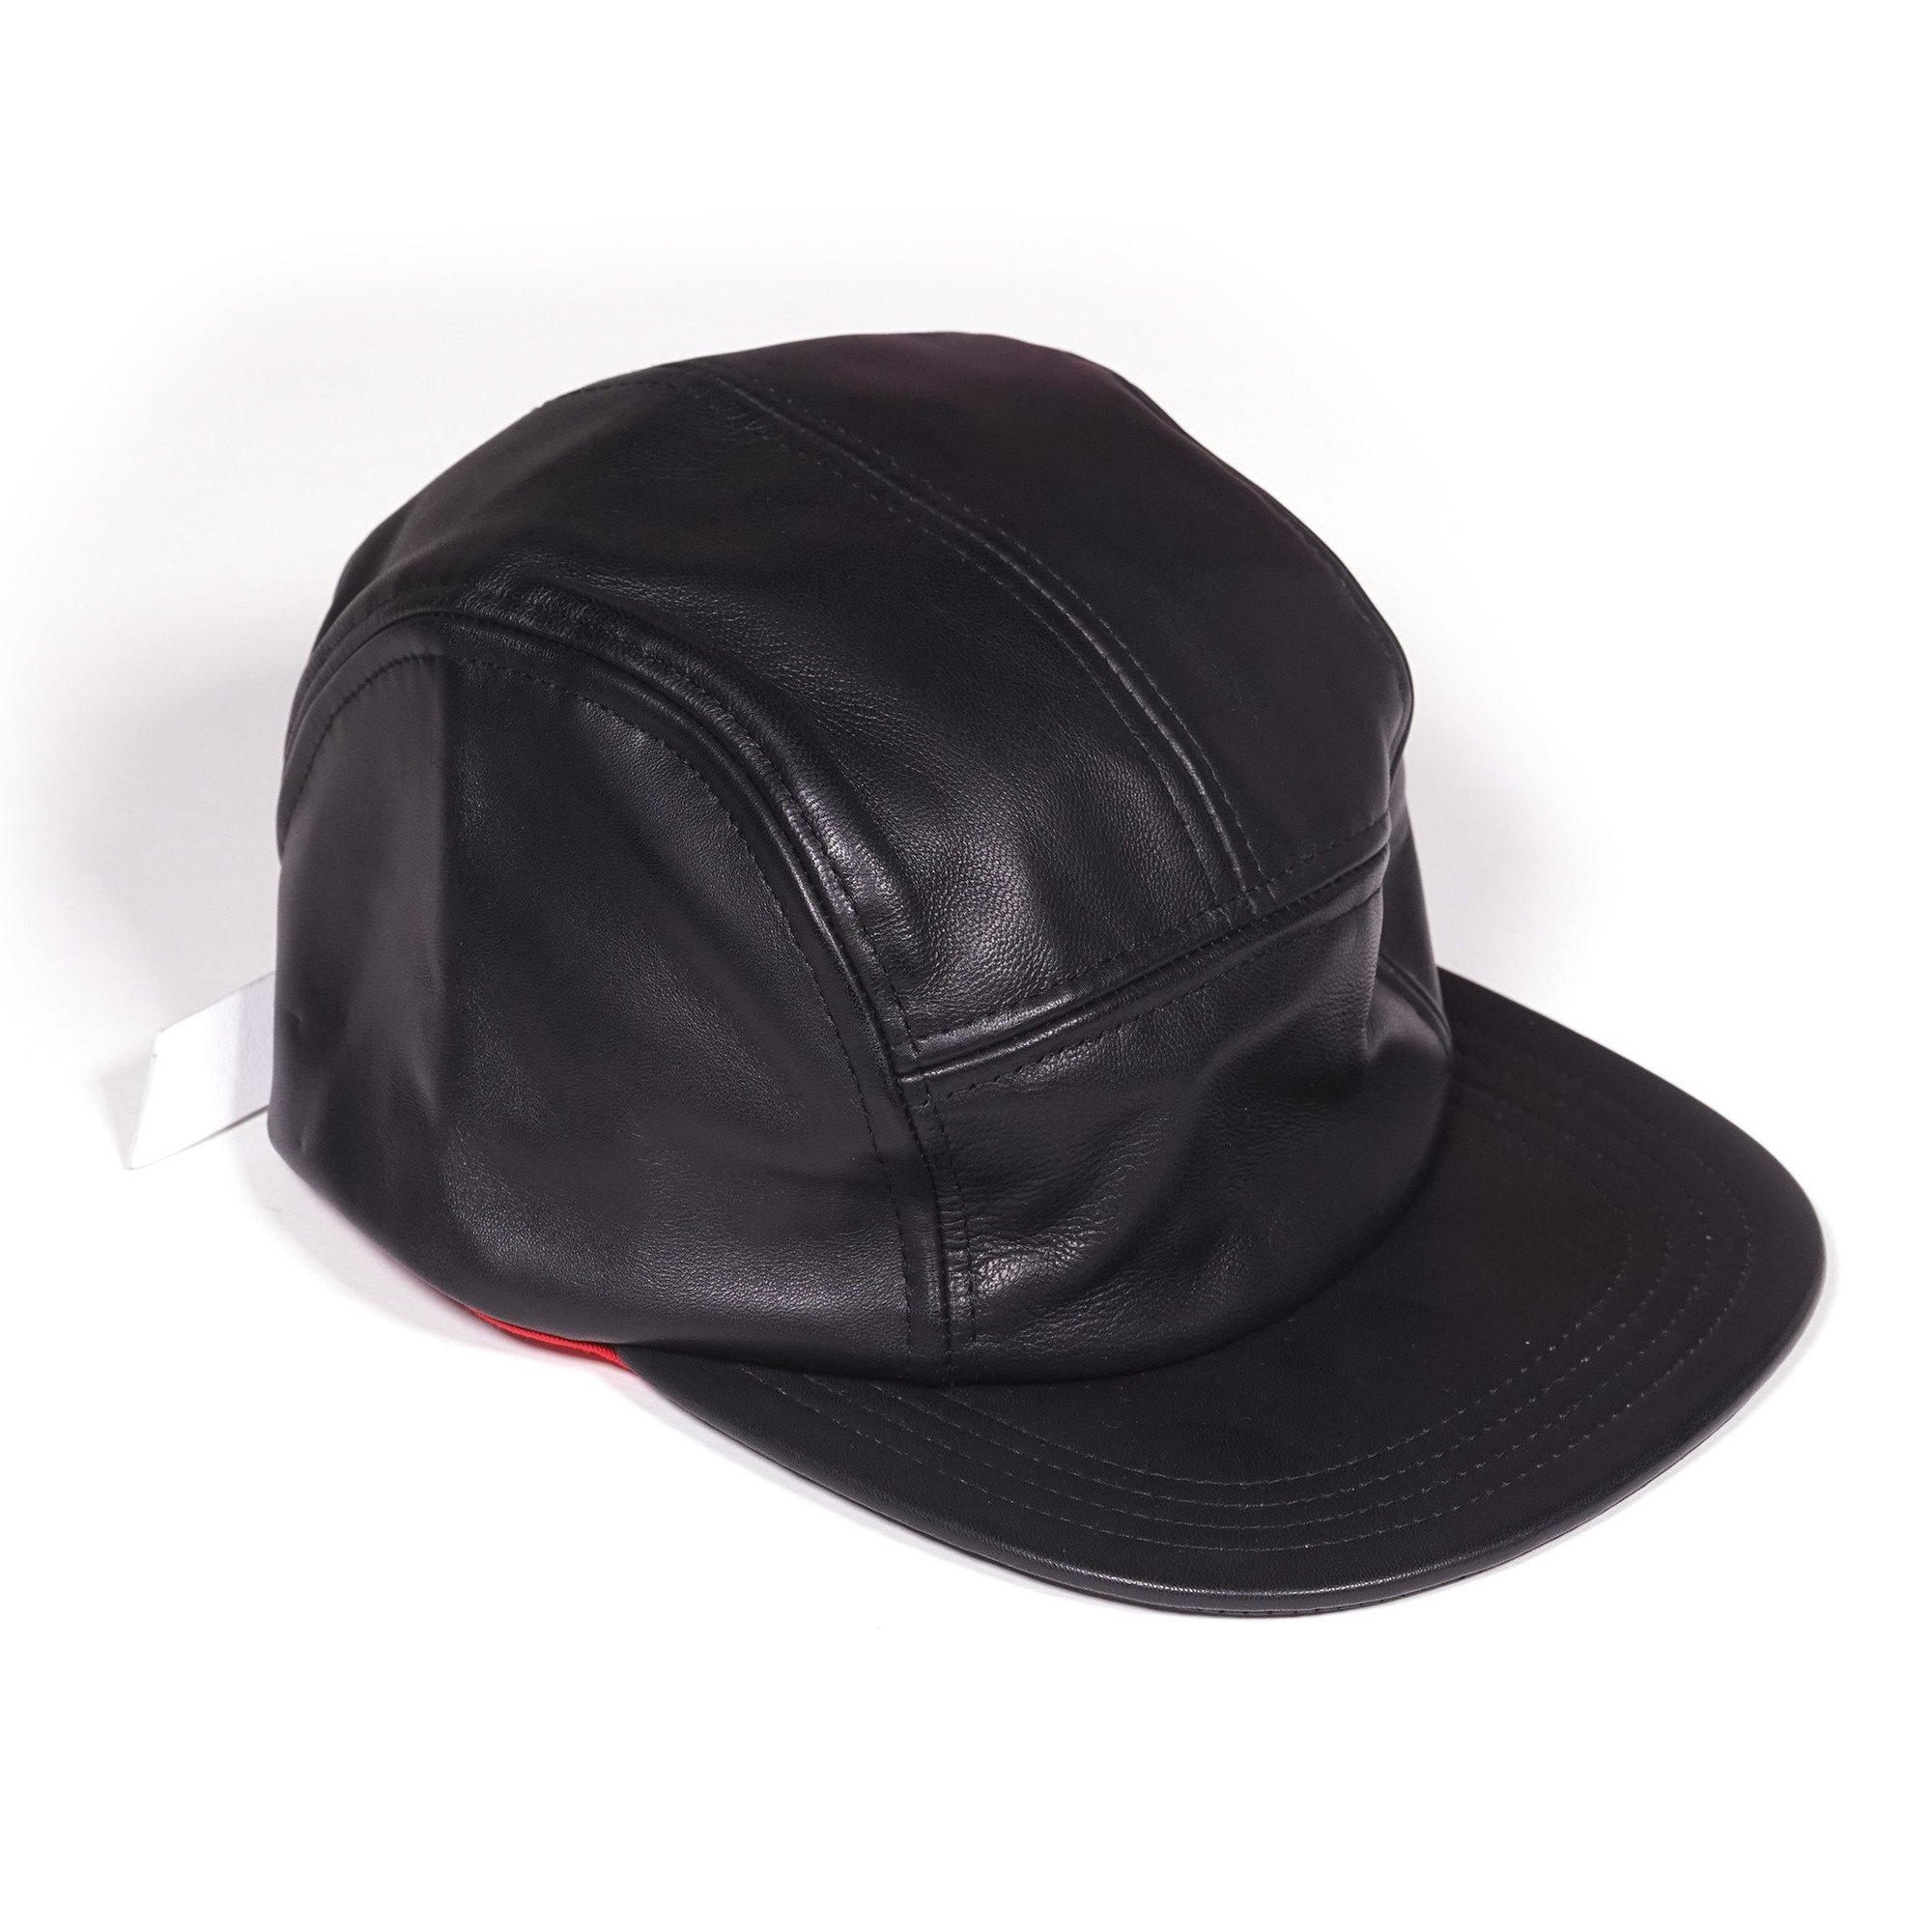 epaulet cap black leather 1.jpg